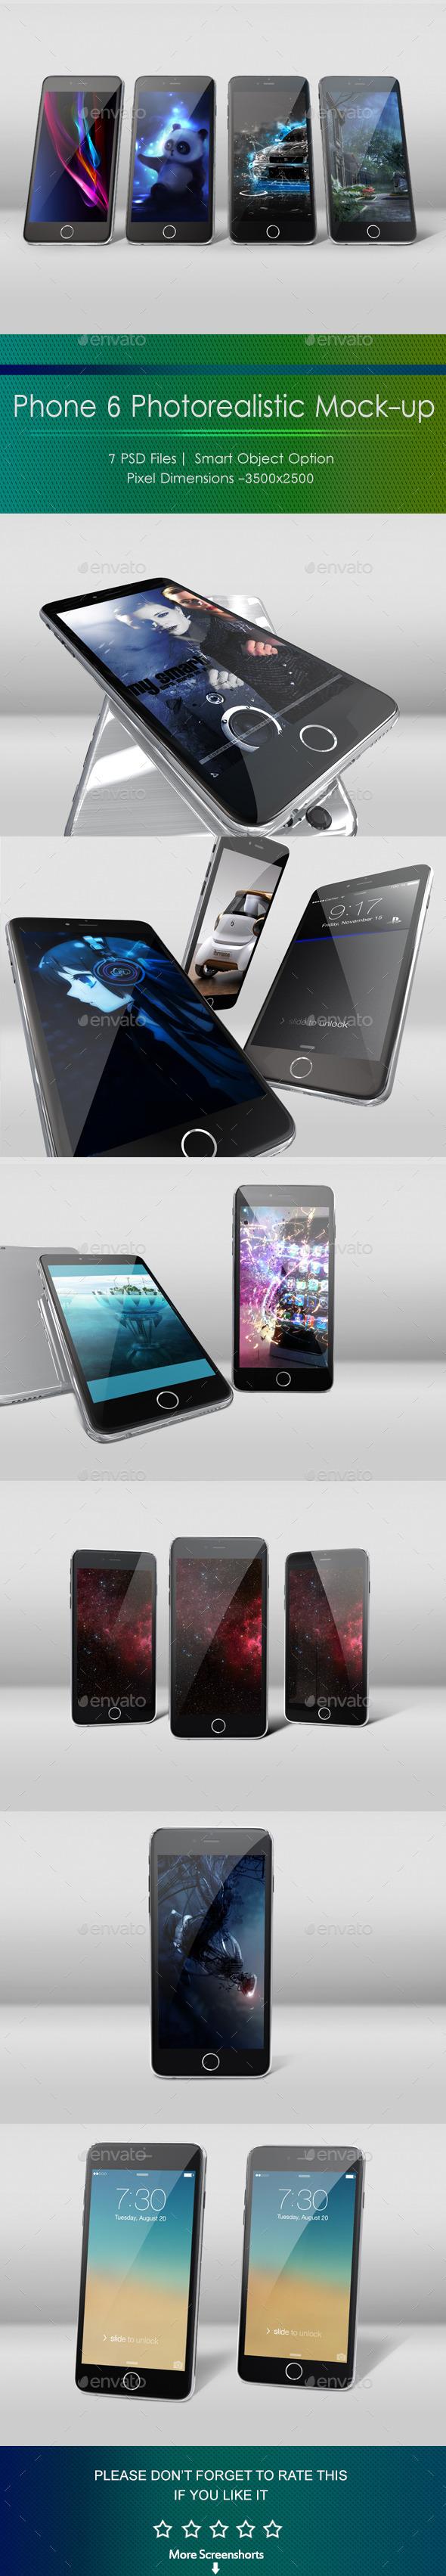 Phone 6 Photorealistic Mockup - Mobile Displays